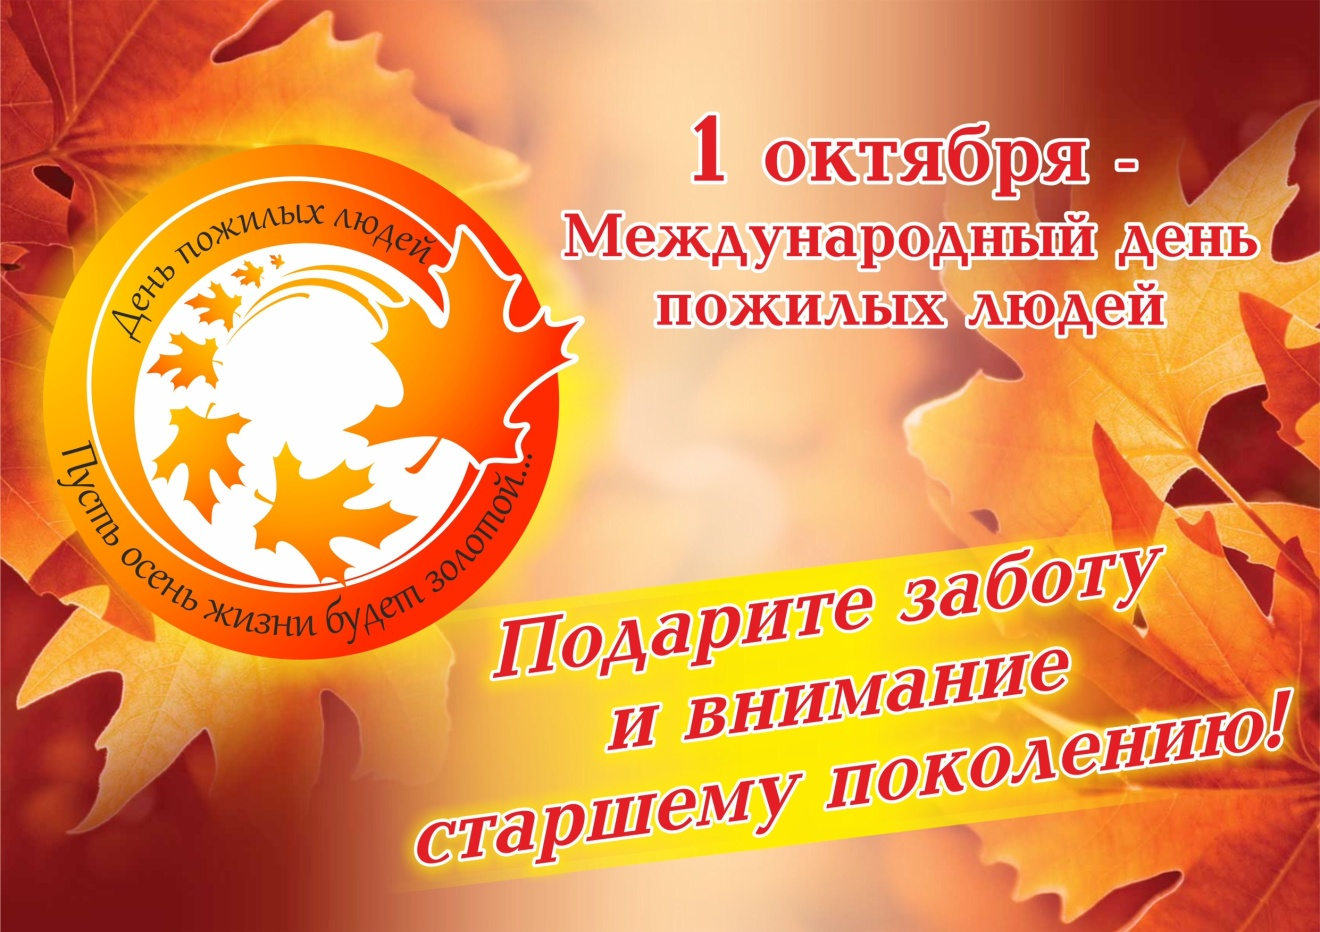 http://sdushor3spb.ru/sites/default/files/pictures/open/foto/users/user1/baner-pust-osen-zhizni-budet-zolotoj.jpg